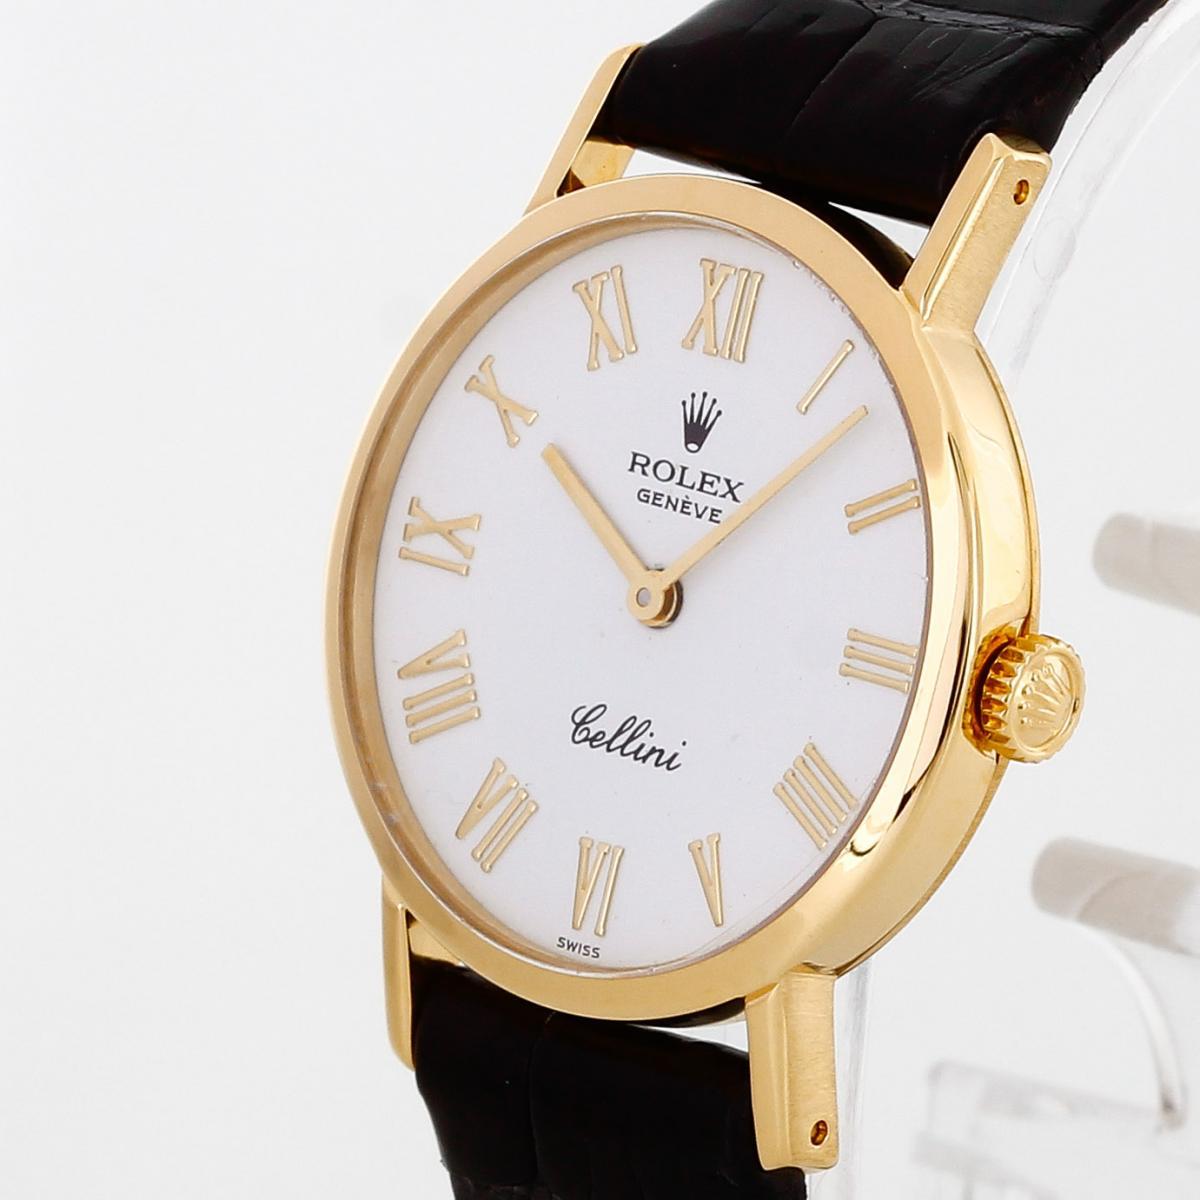 Rolex Cellini 18 K Gelbgold an Lederband Ref. 4109/8